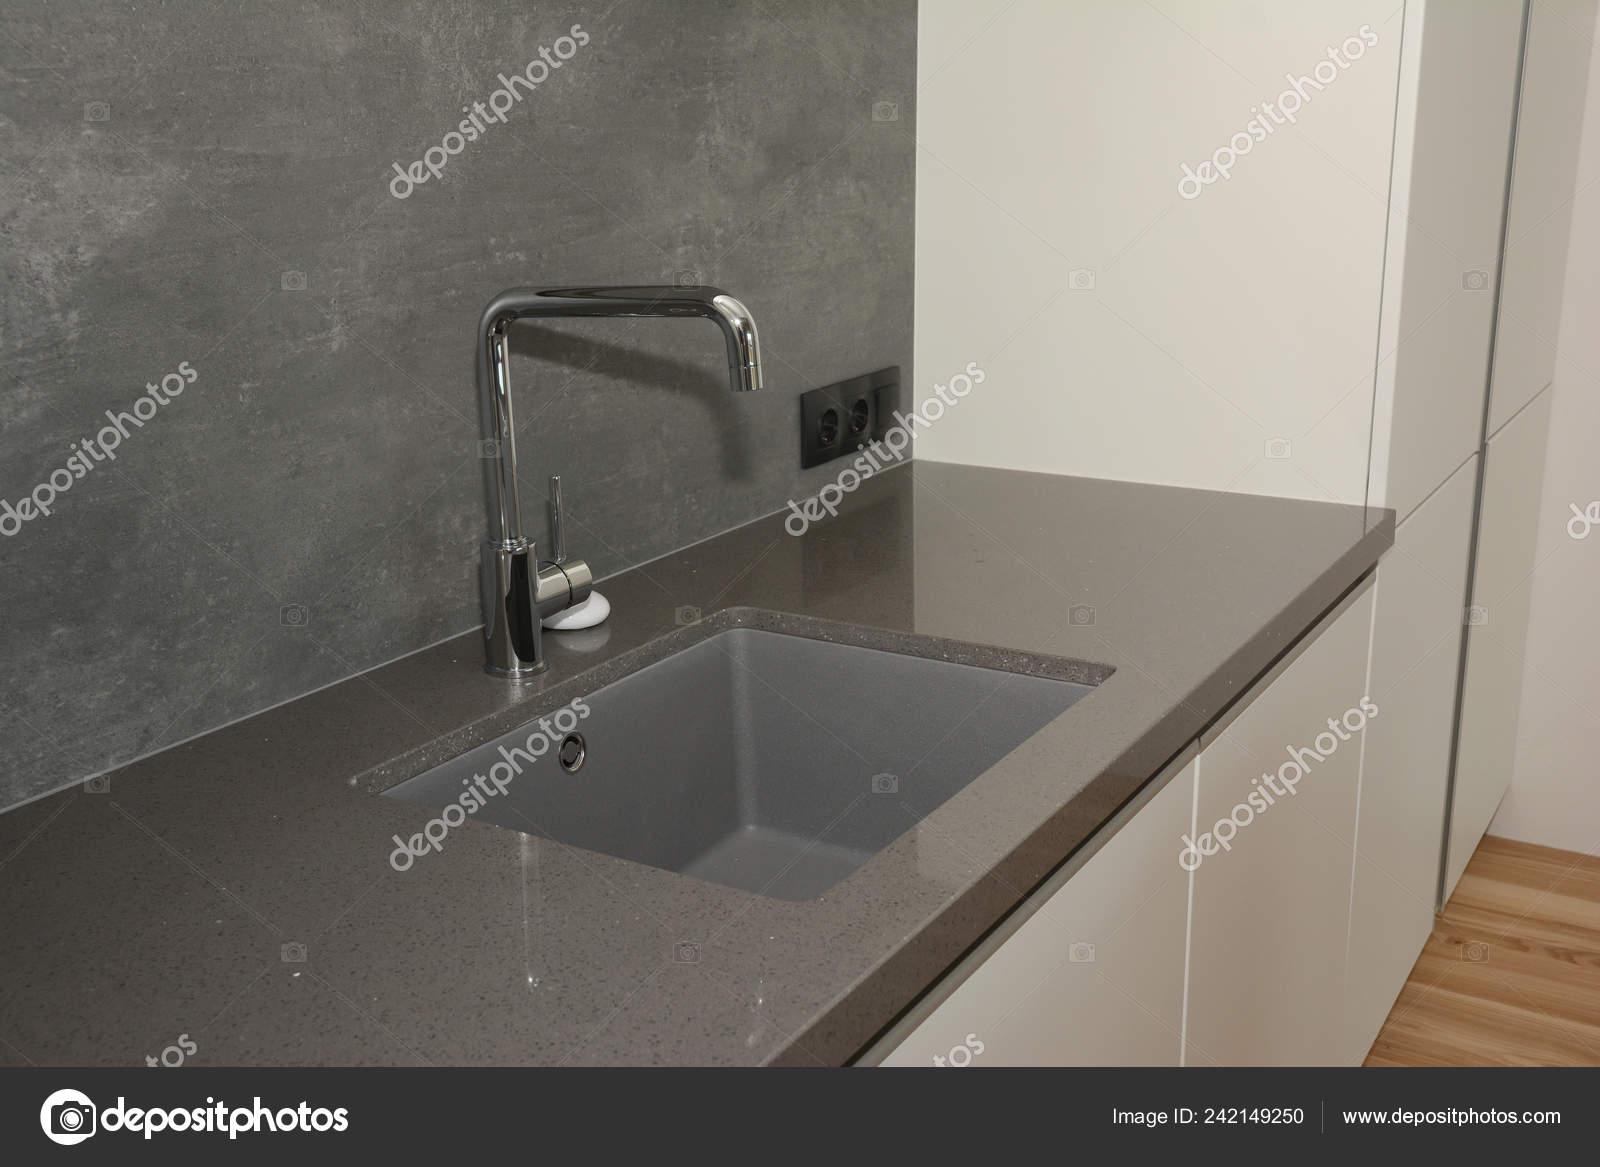 black kitchen sink tap water kitchen modern kitchen metal faucet stock photo image by c thefutureis 242149250